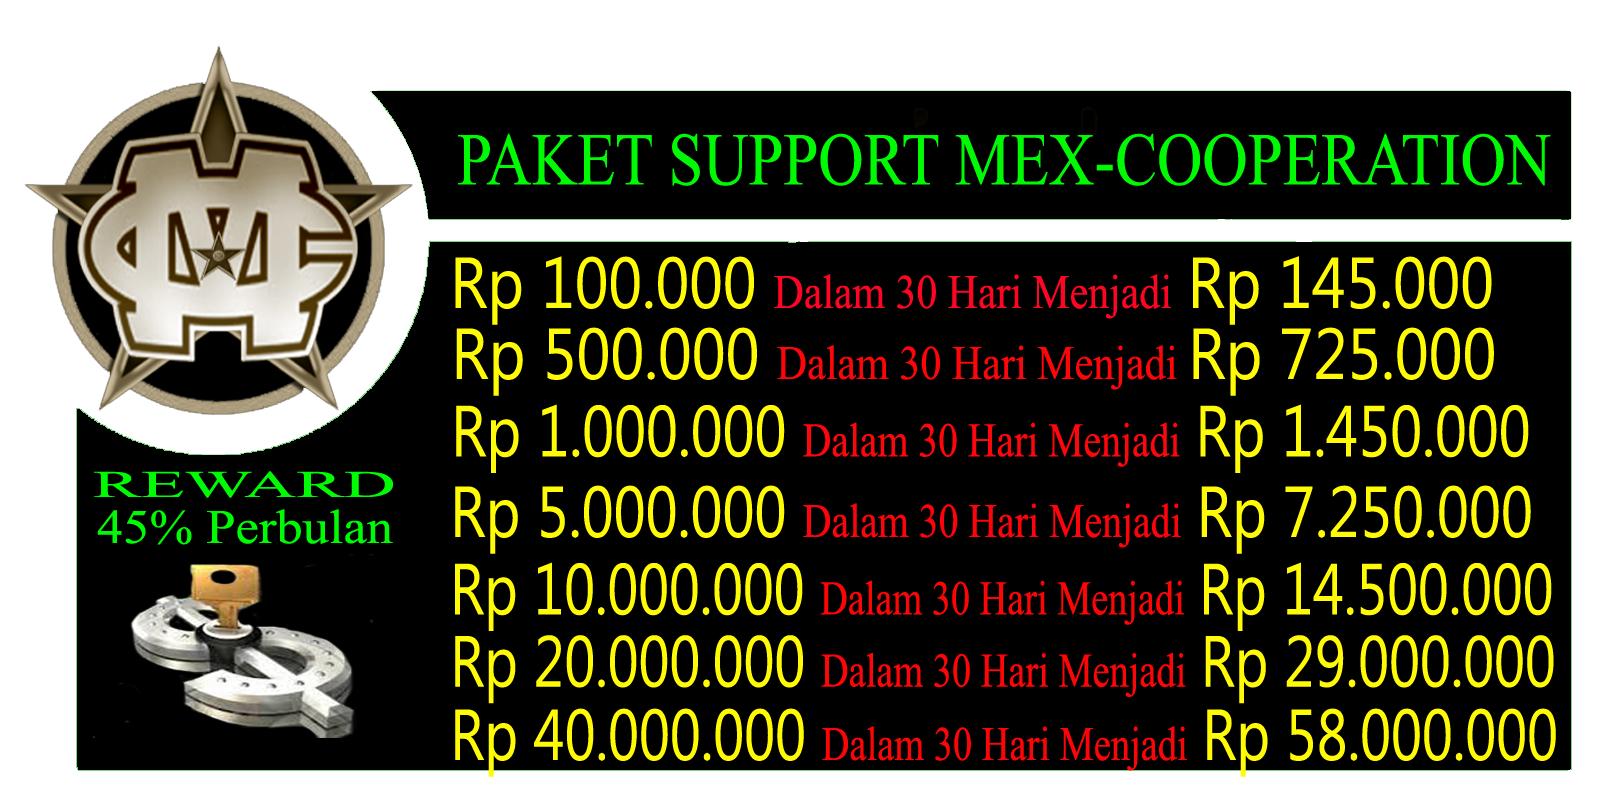 Mex Cooperation Bisnis Investasi Profit Tertinggi di Indonesia